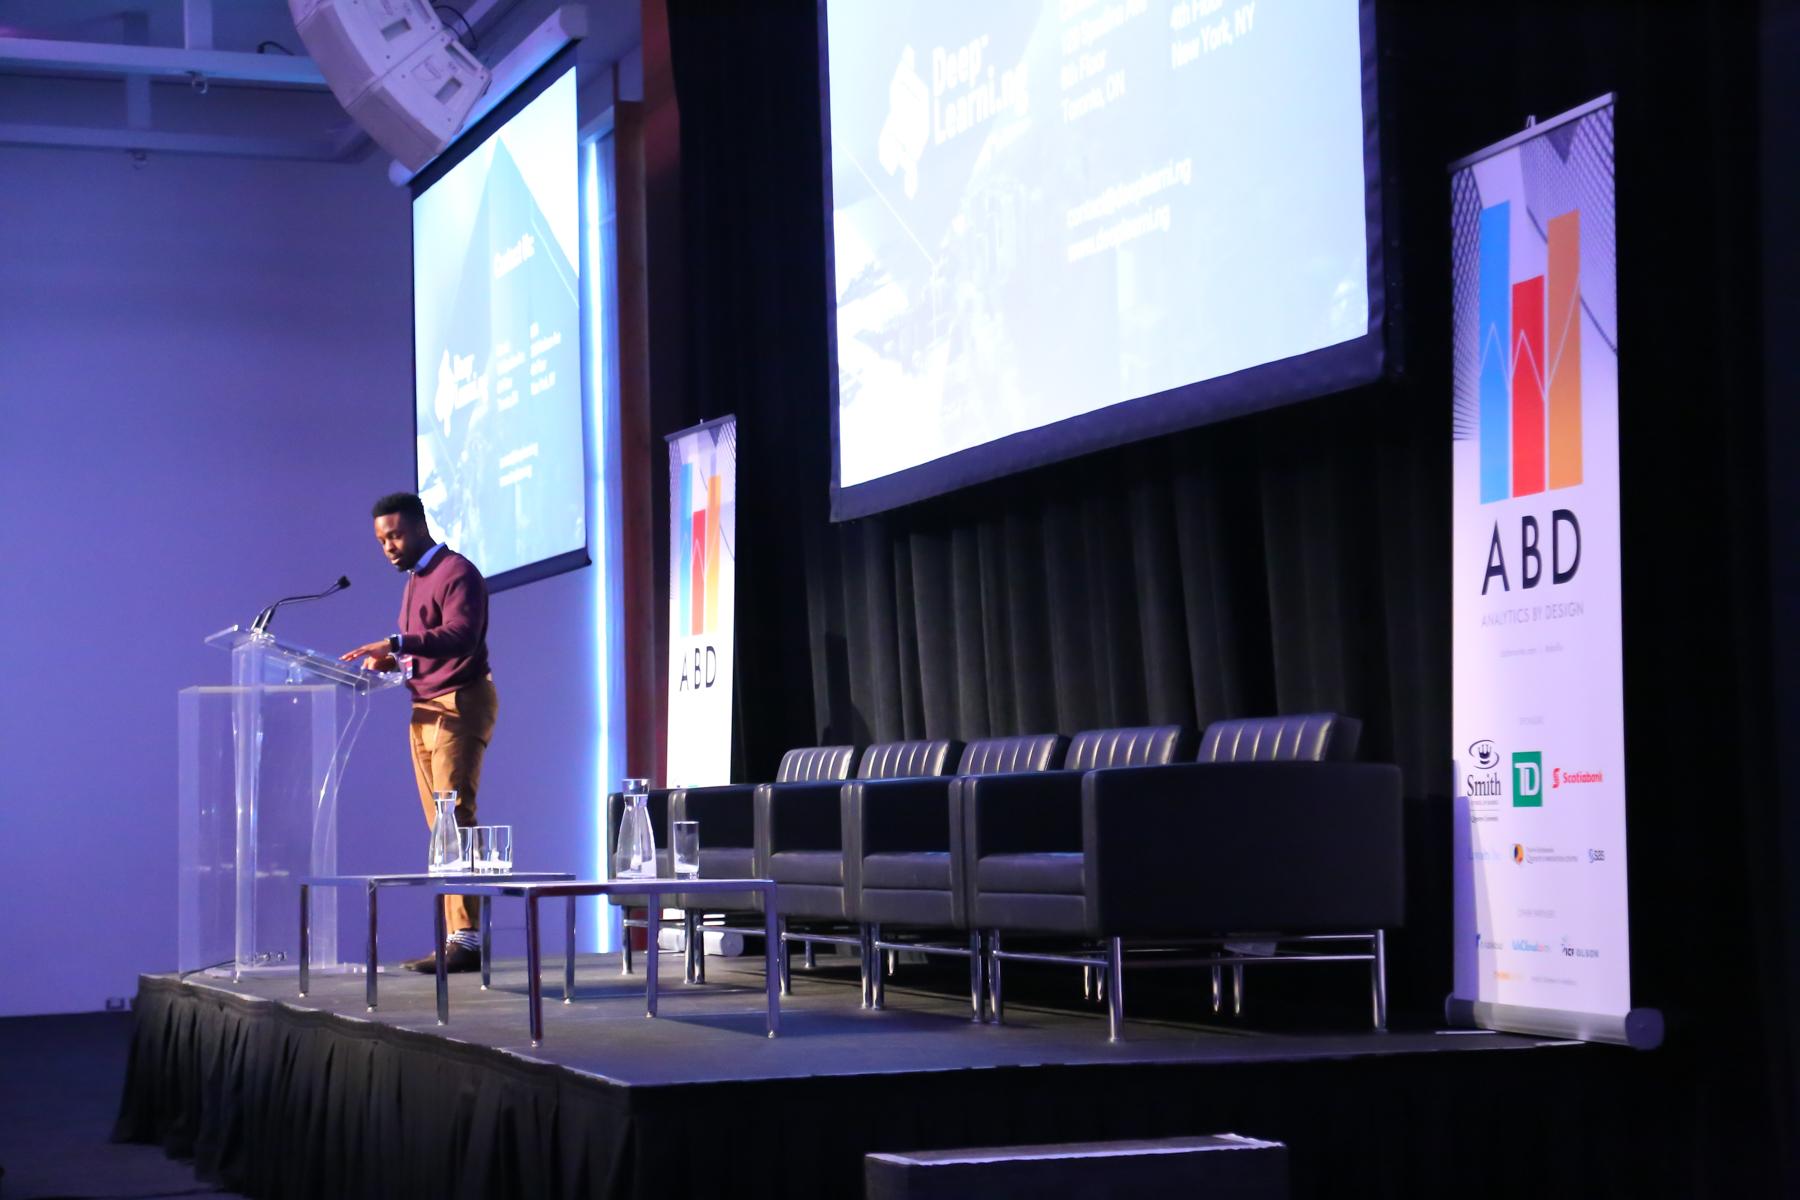 ABD_Conference_2018-017.jpg